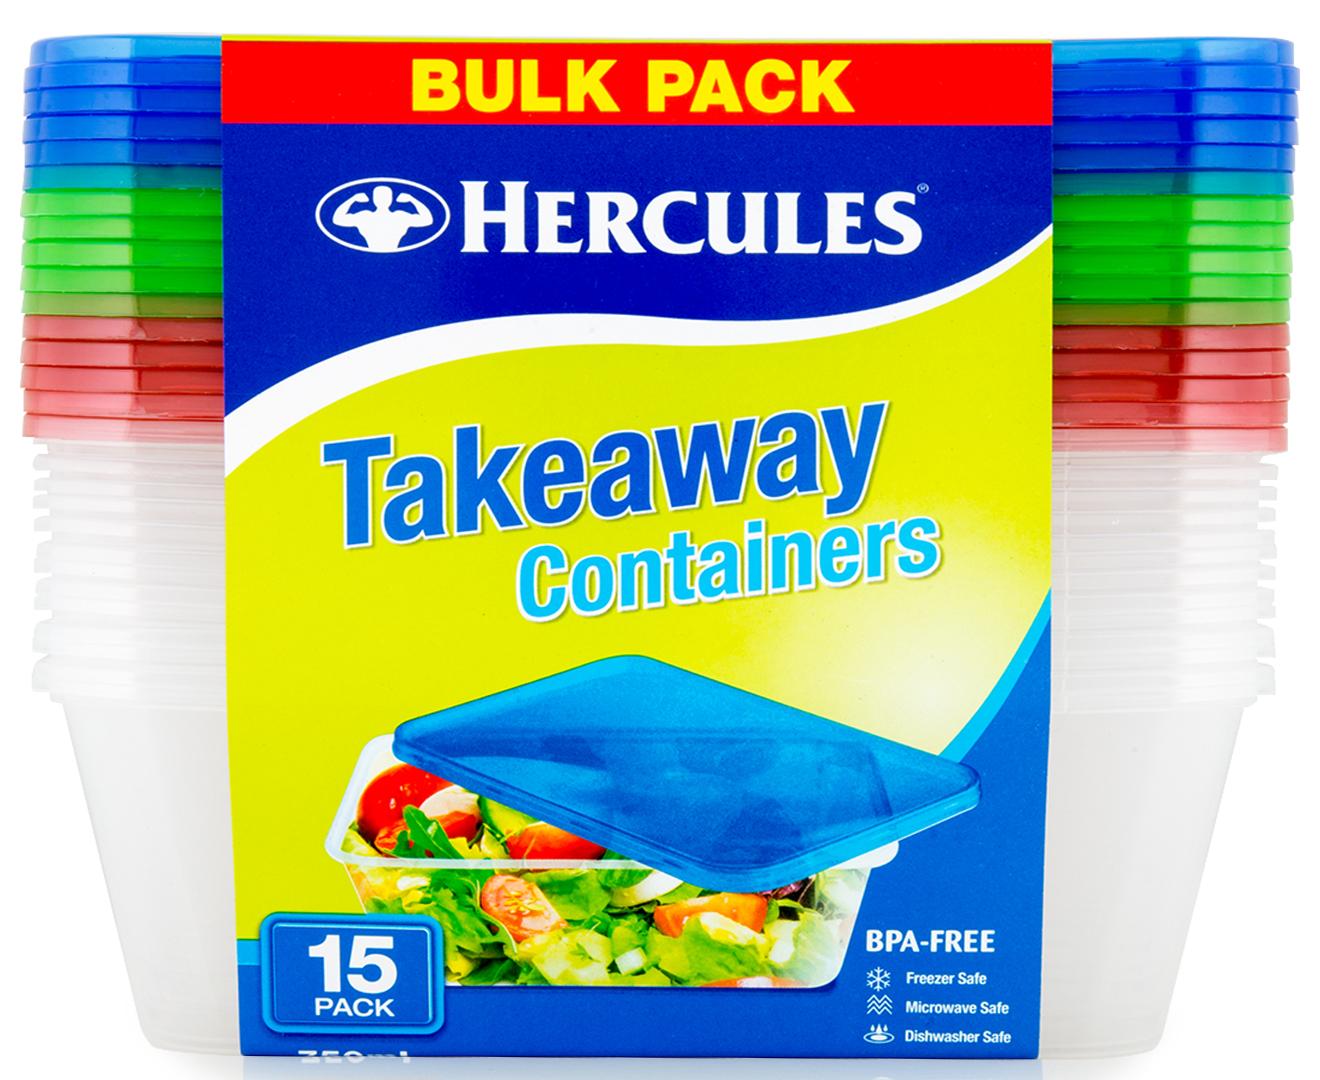 2 x 15pk Hercules Takeaway Containers 750mL - Multi